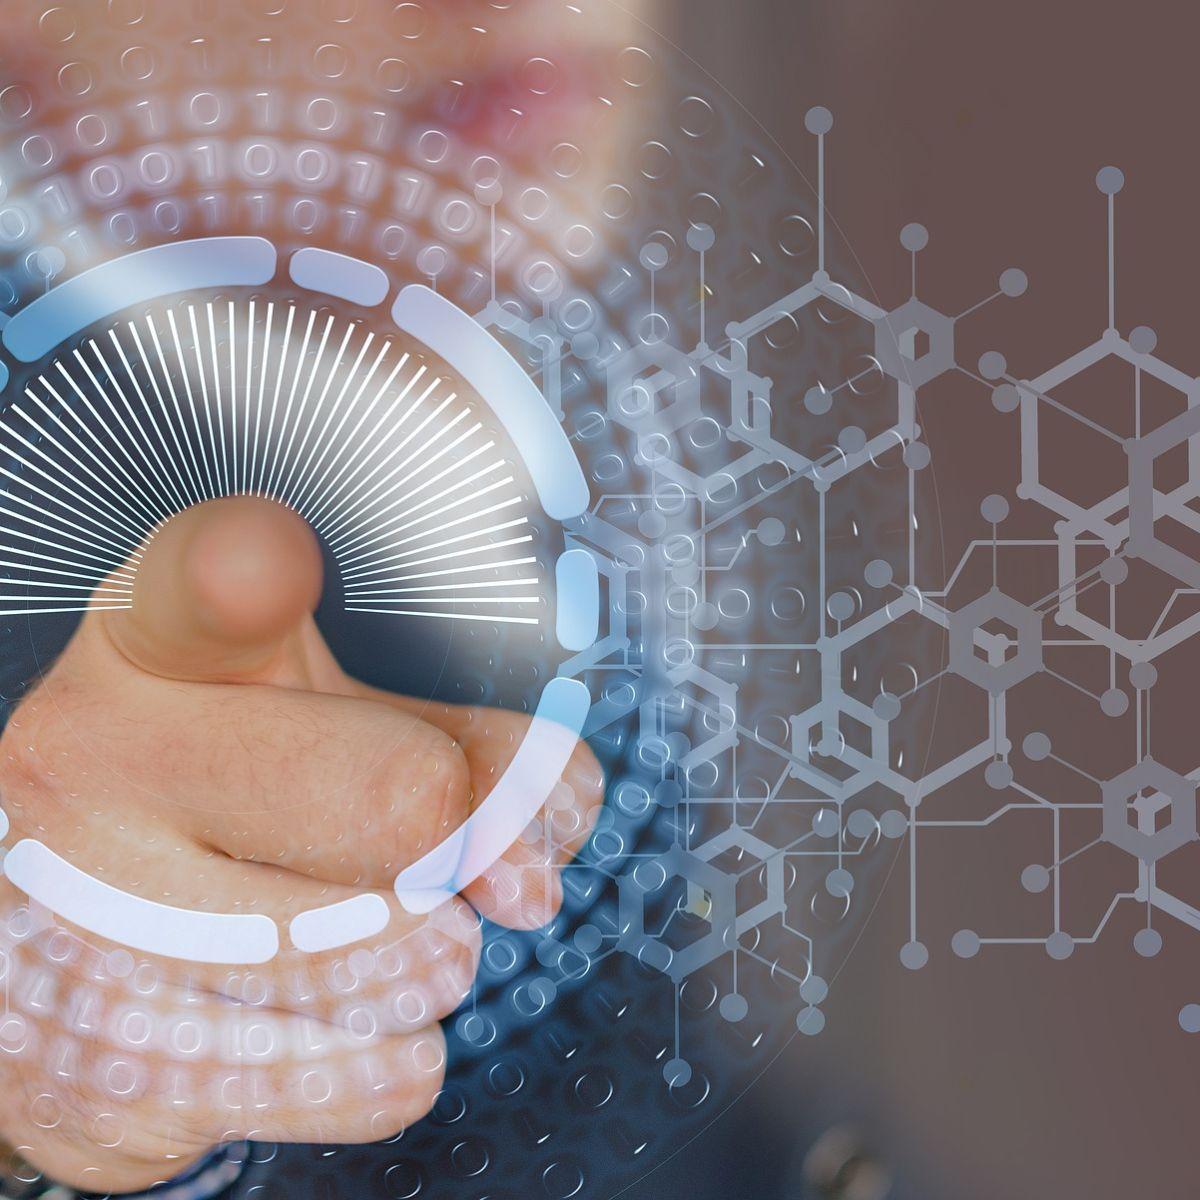 Internet, cyber, touch-screen, finger, future